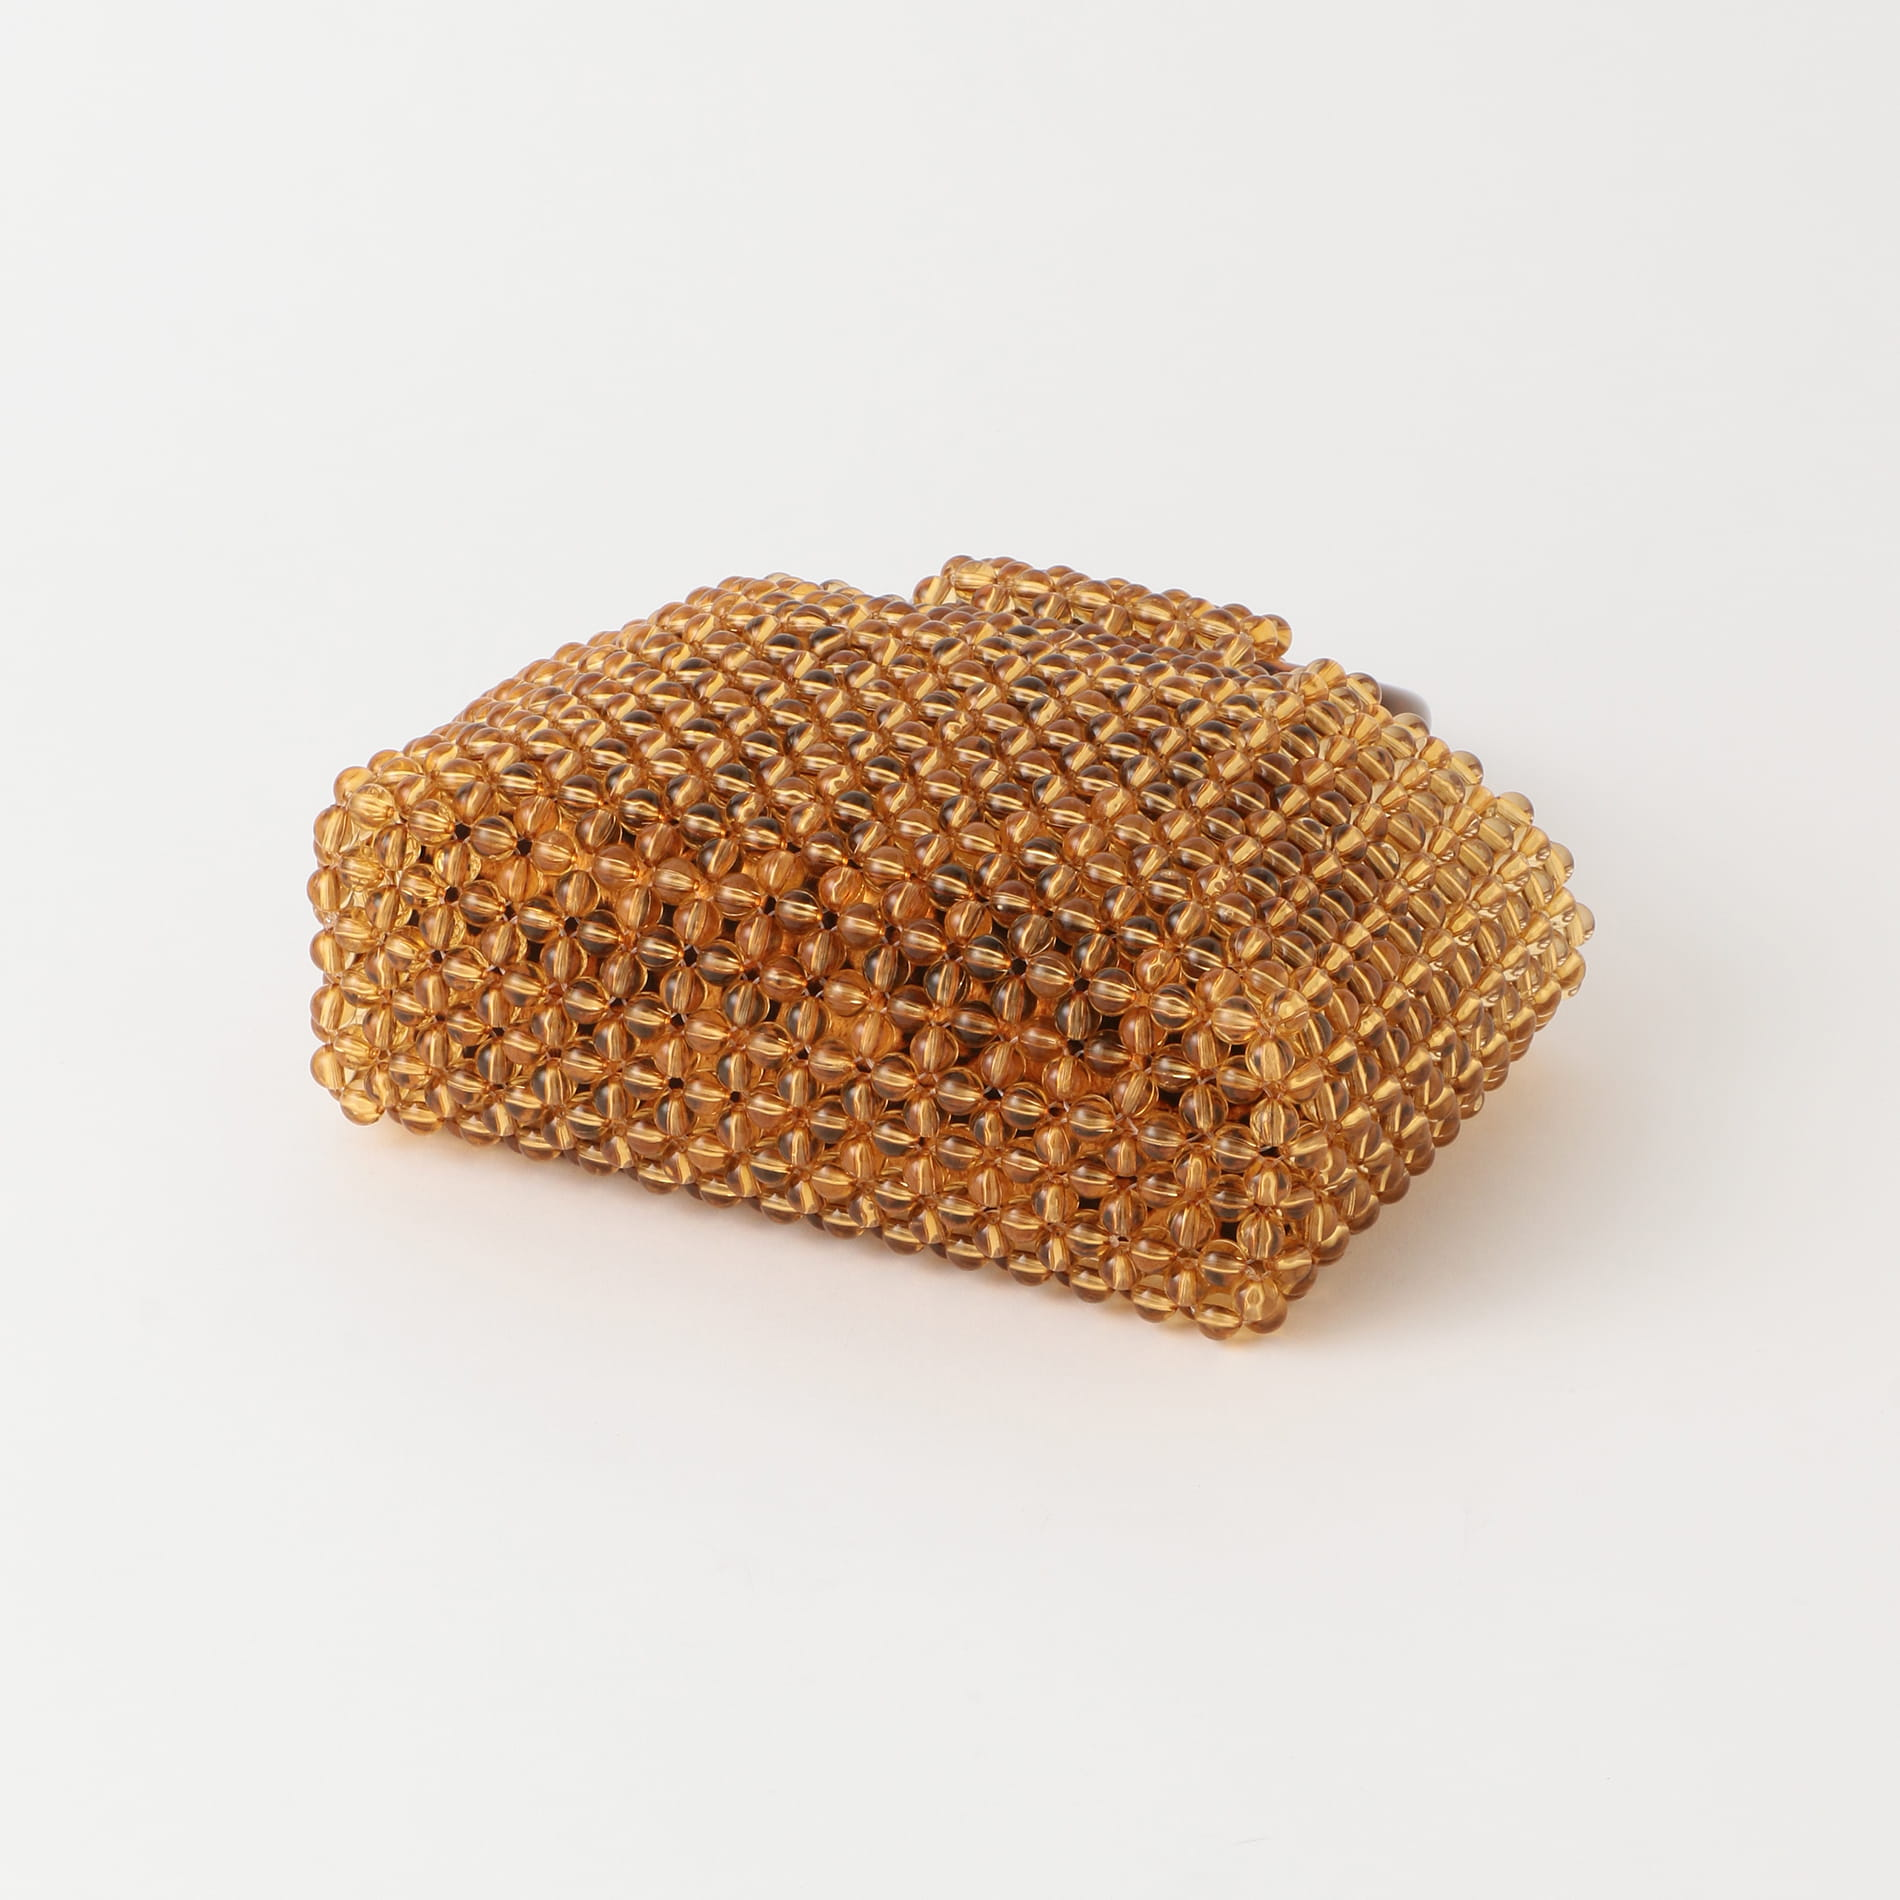 【TSURU by MARIKO OIKAWA】WOMEN ビーズバッグ Noisette acrylic resin beads WB-1206050